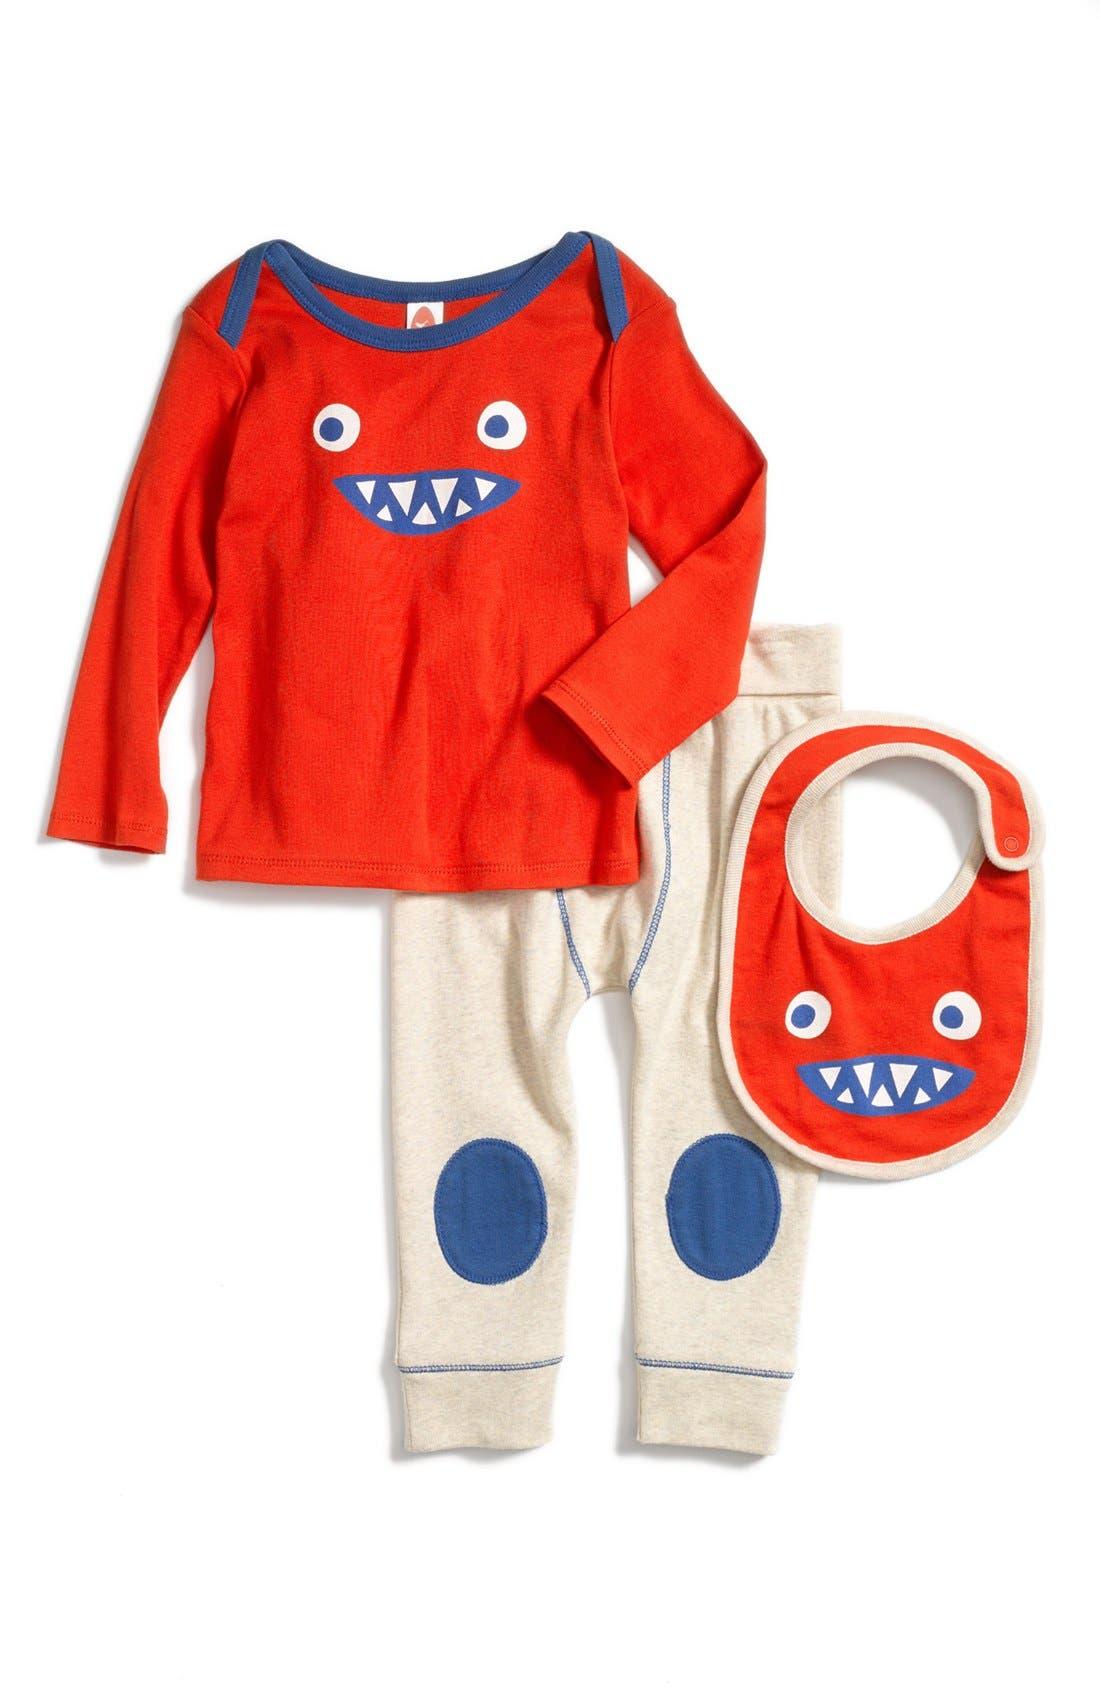 Alternate Image 1 Selected - Stem Baby Organic Cotton Shirt, Pants & Bib (Baby Boys)